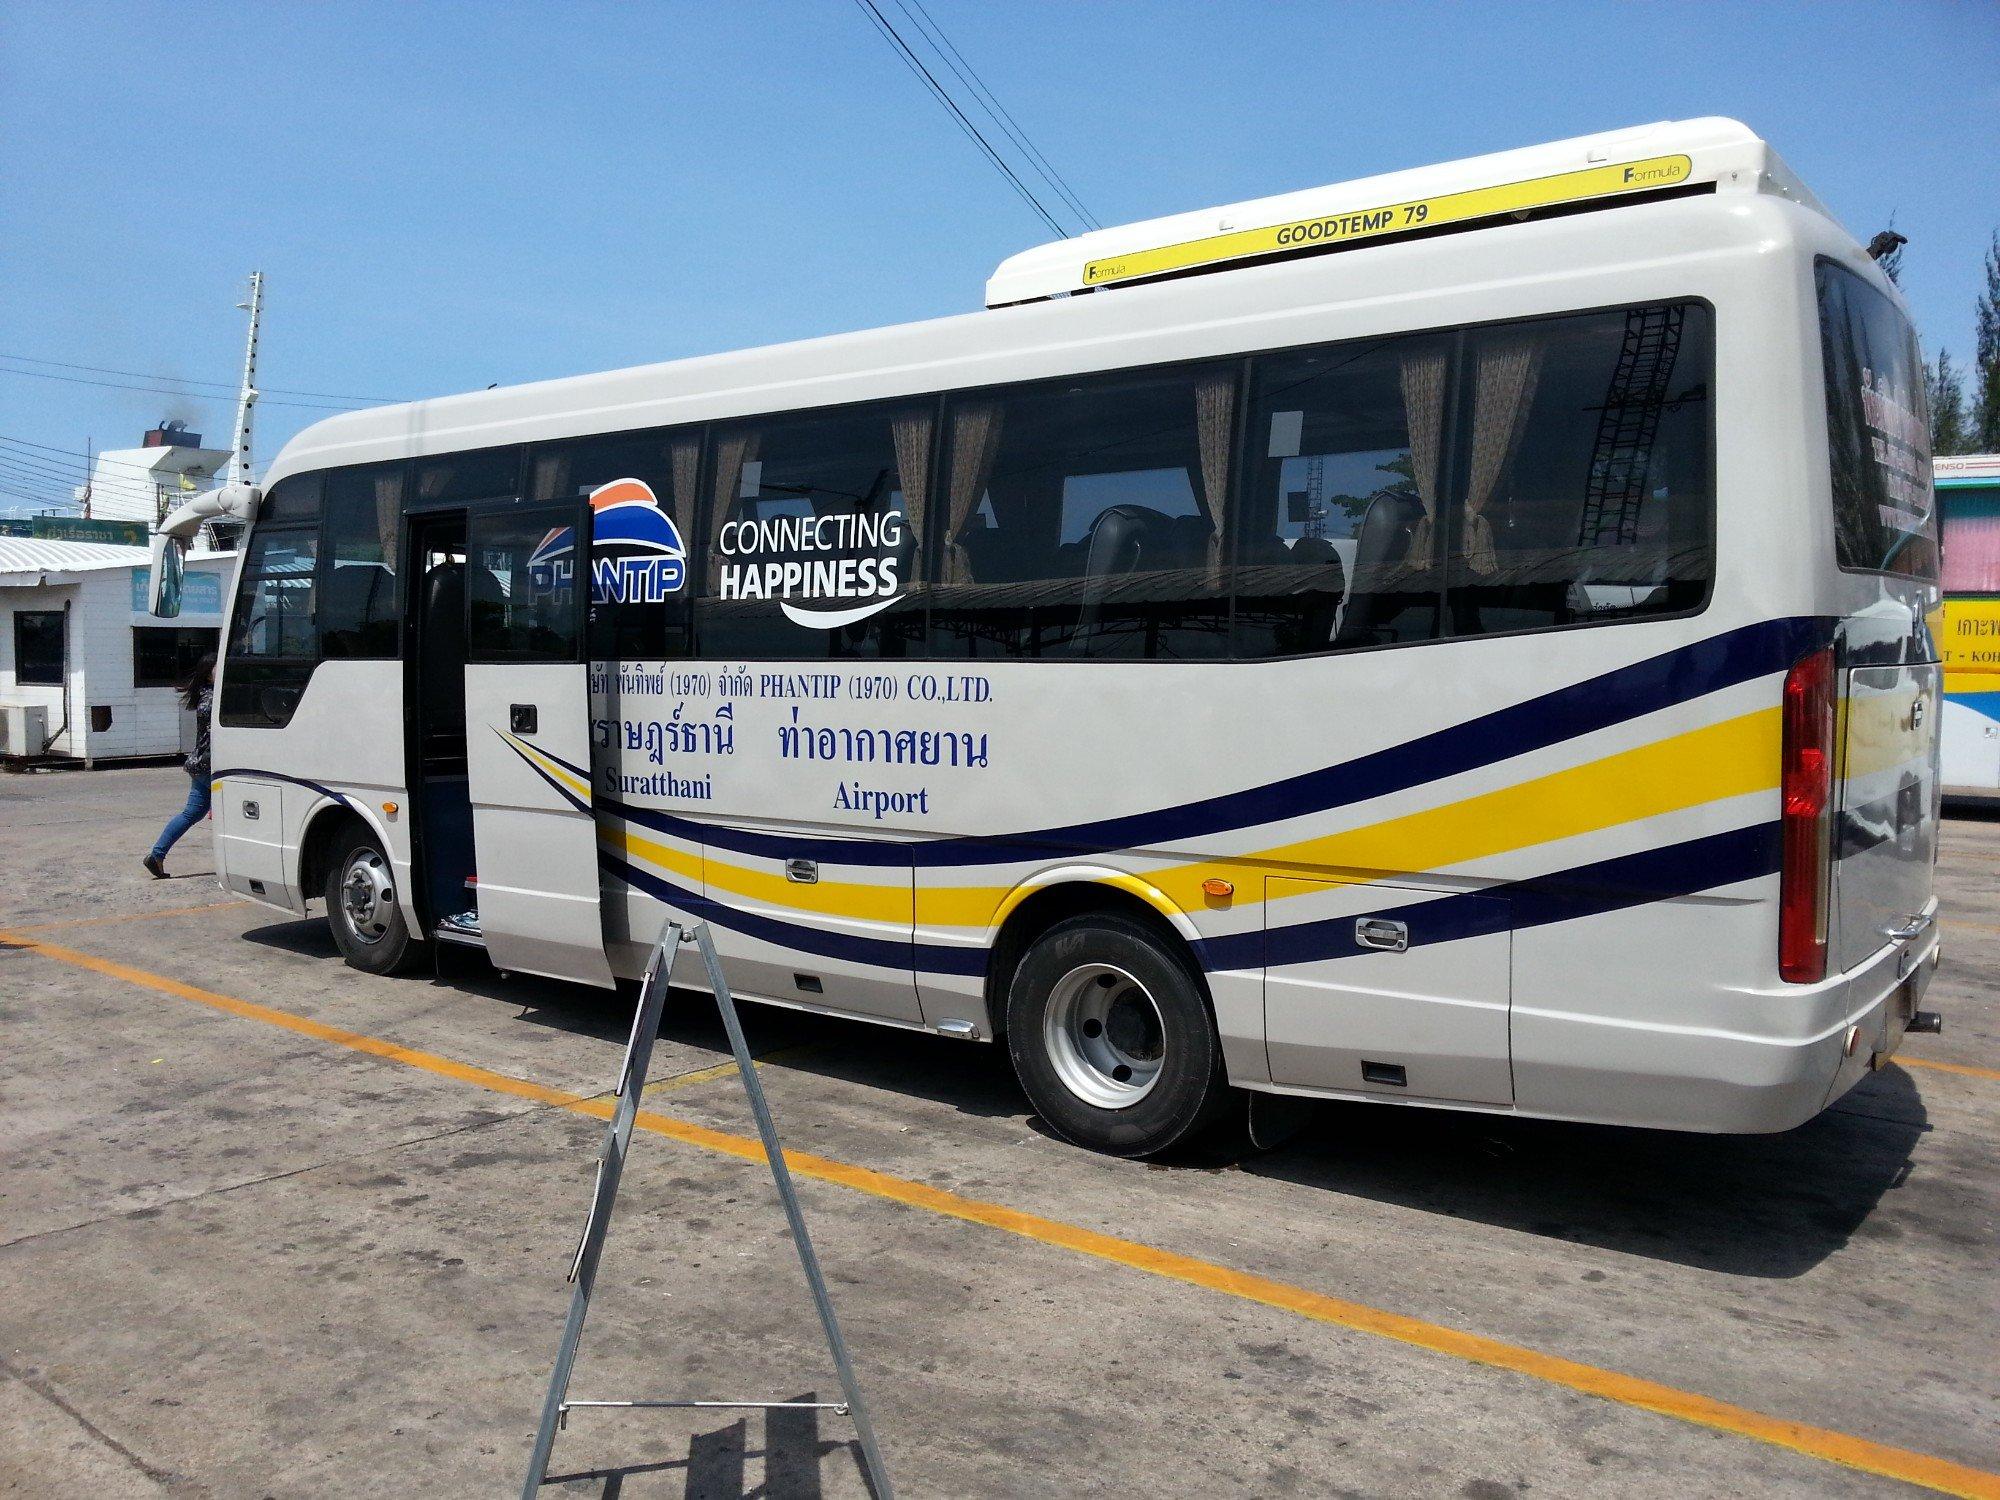 Phantip Travel Bus Service